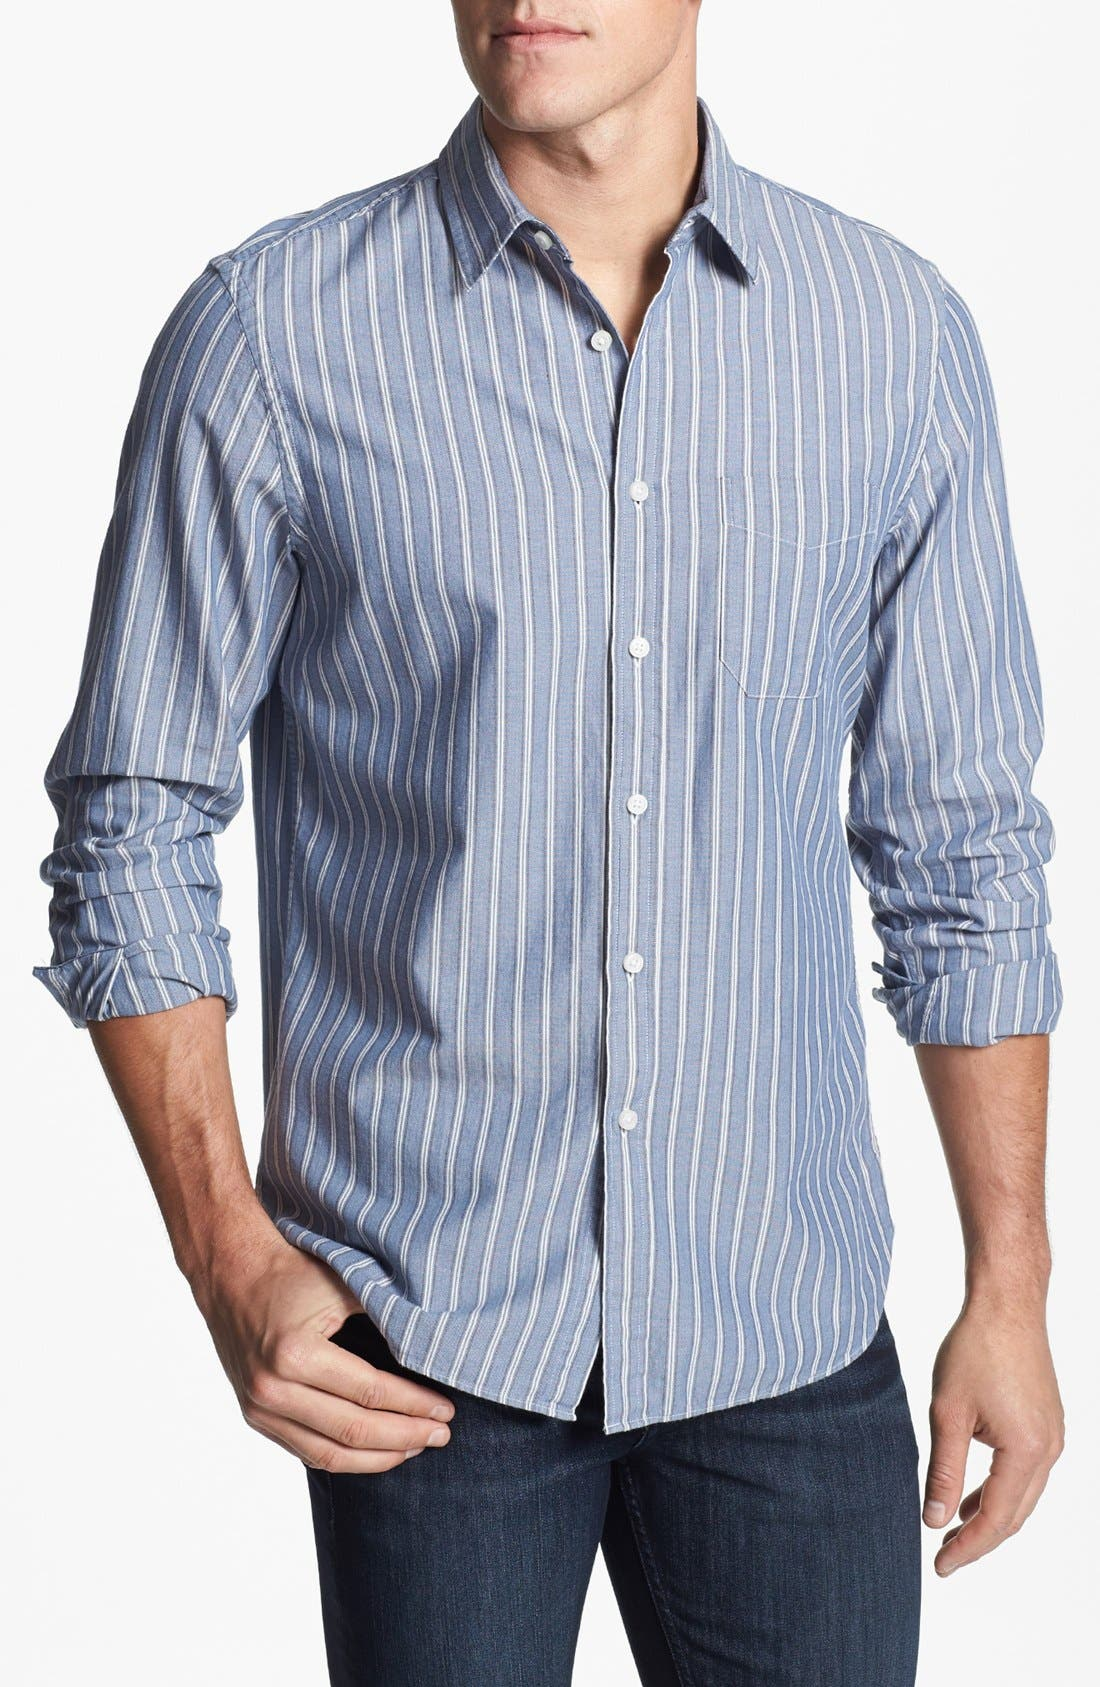 Main Image - Wallin & Bros. 'Signature' Trim Fit Sport Shirt